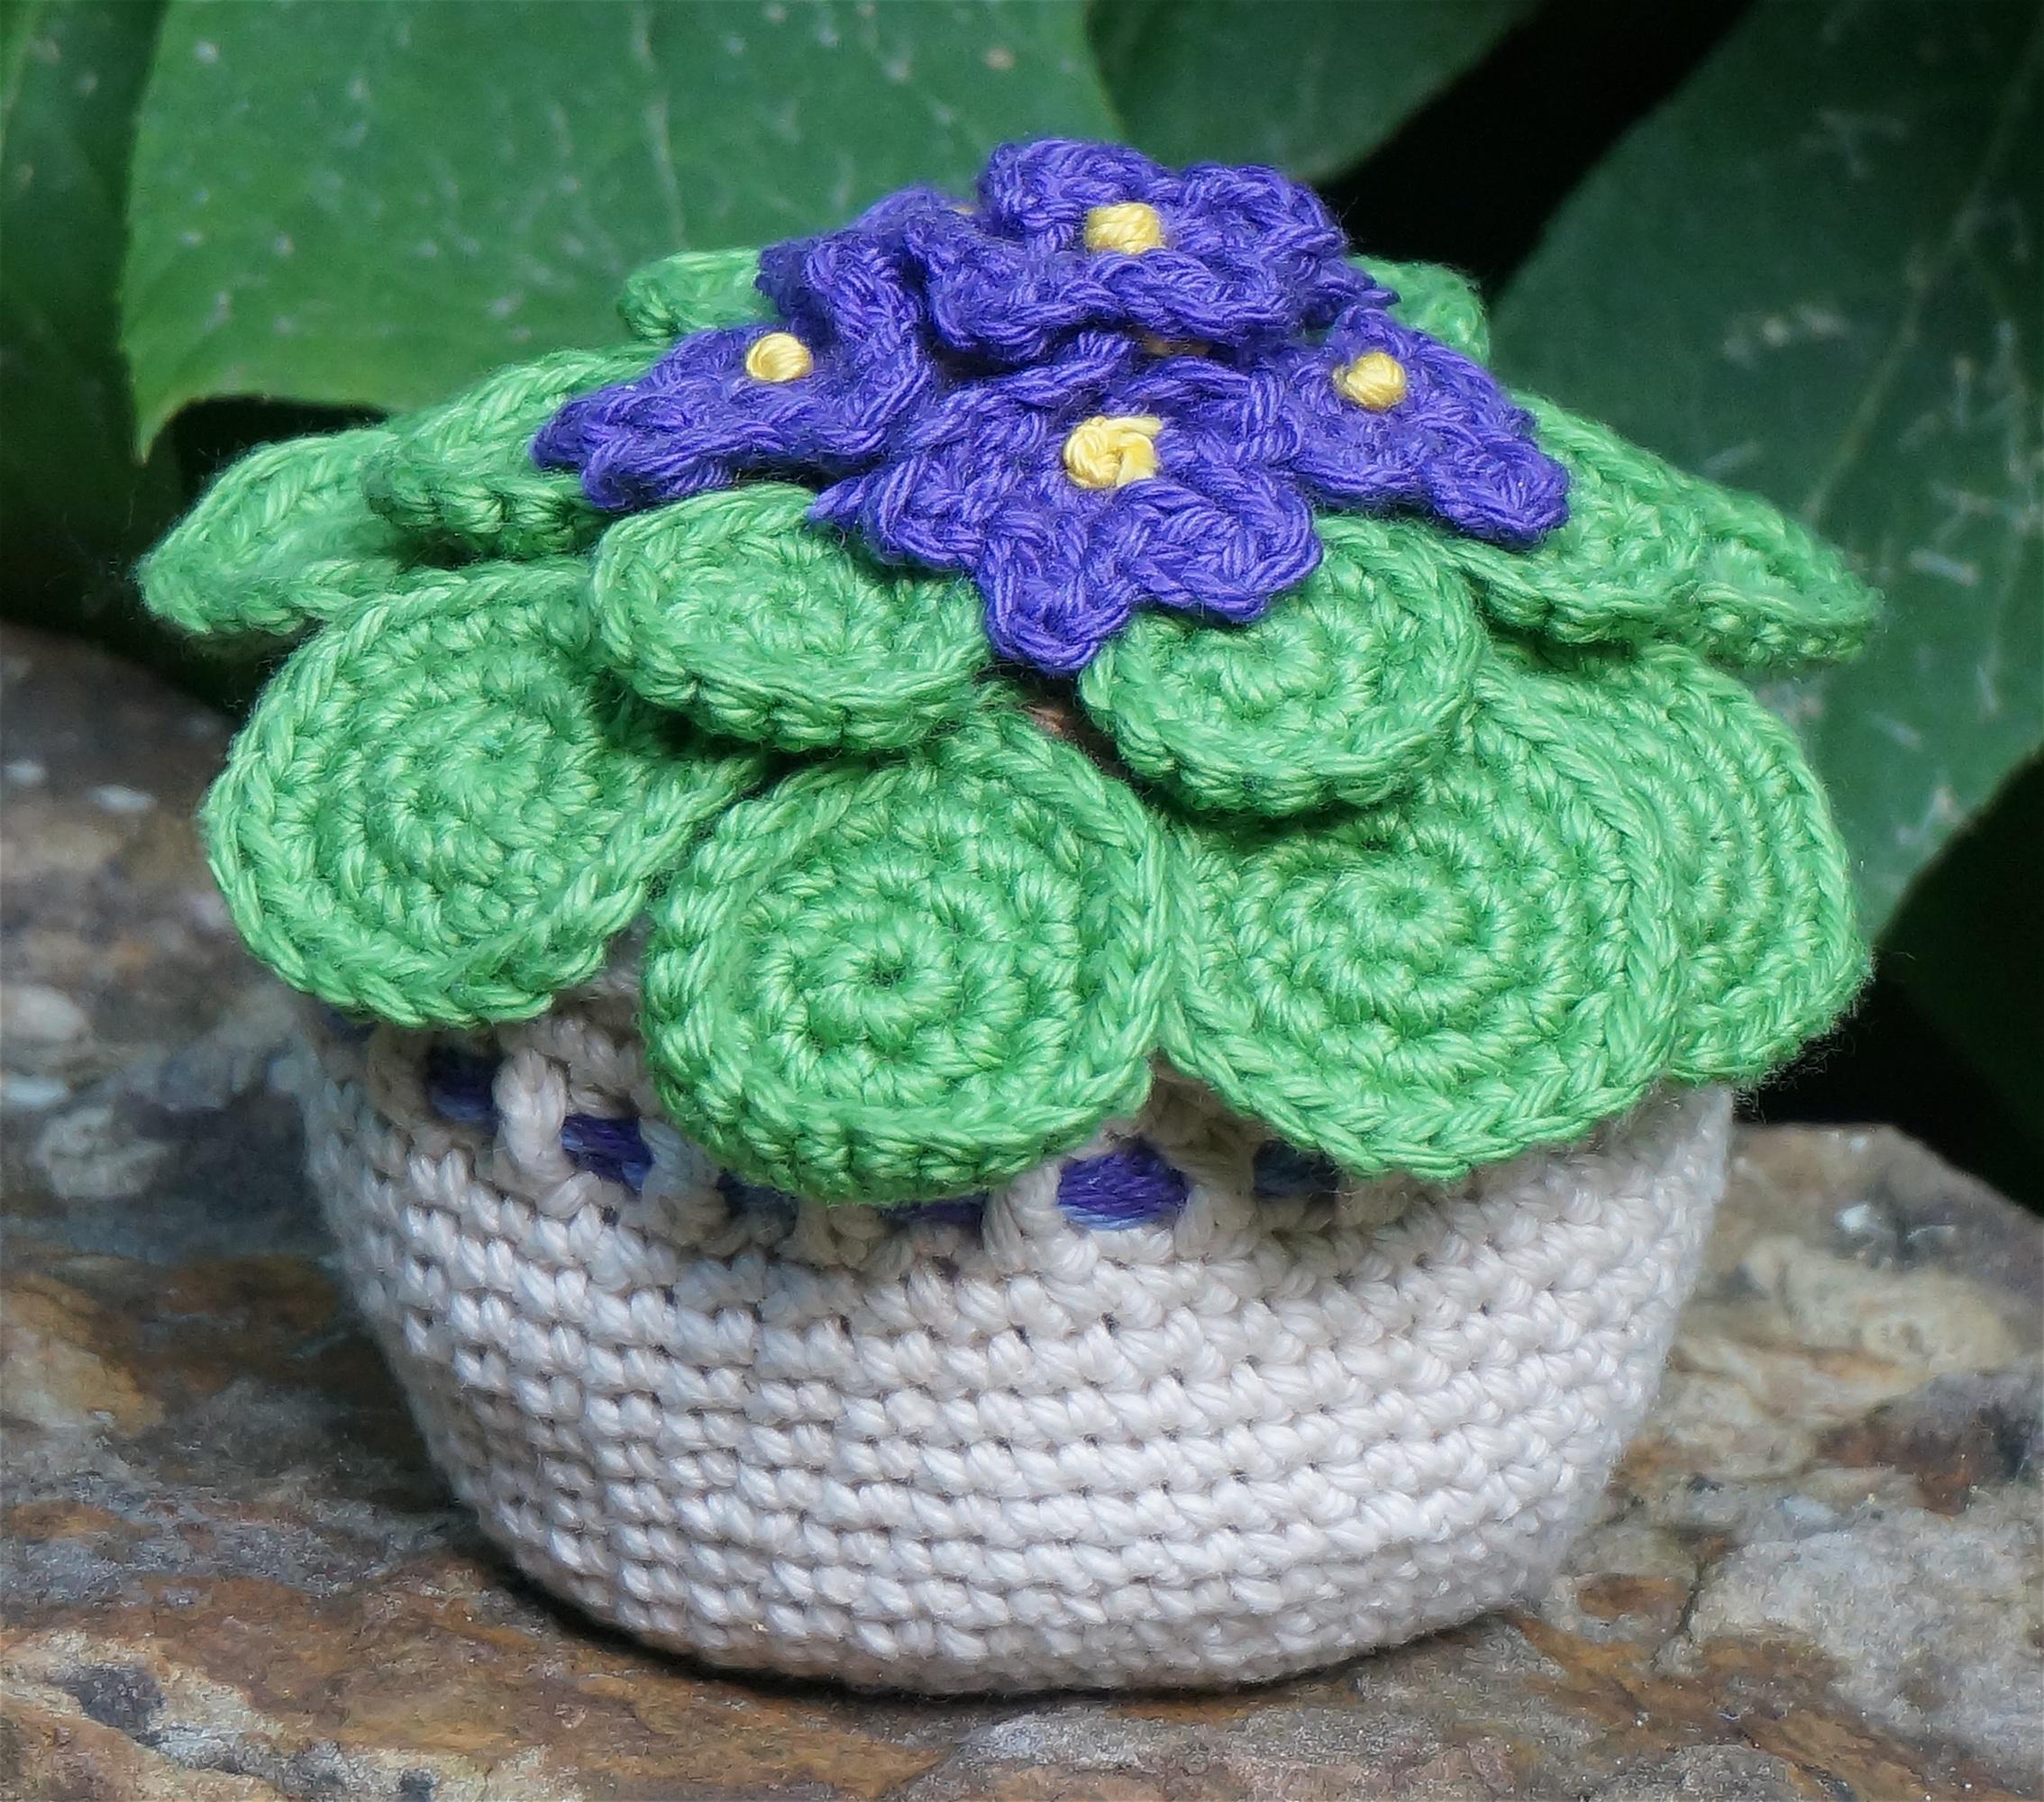 Fotos gratis : flor, púrpura, decoración, patrón, verde, Produce ...